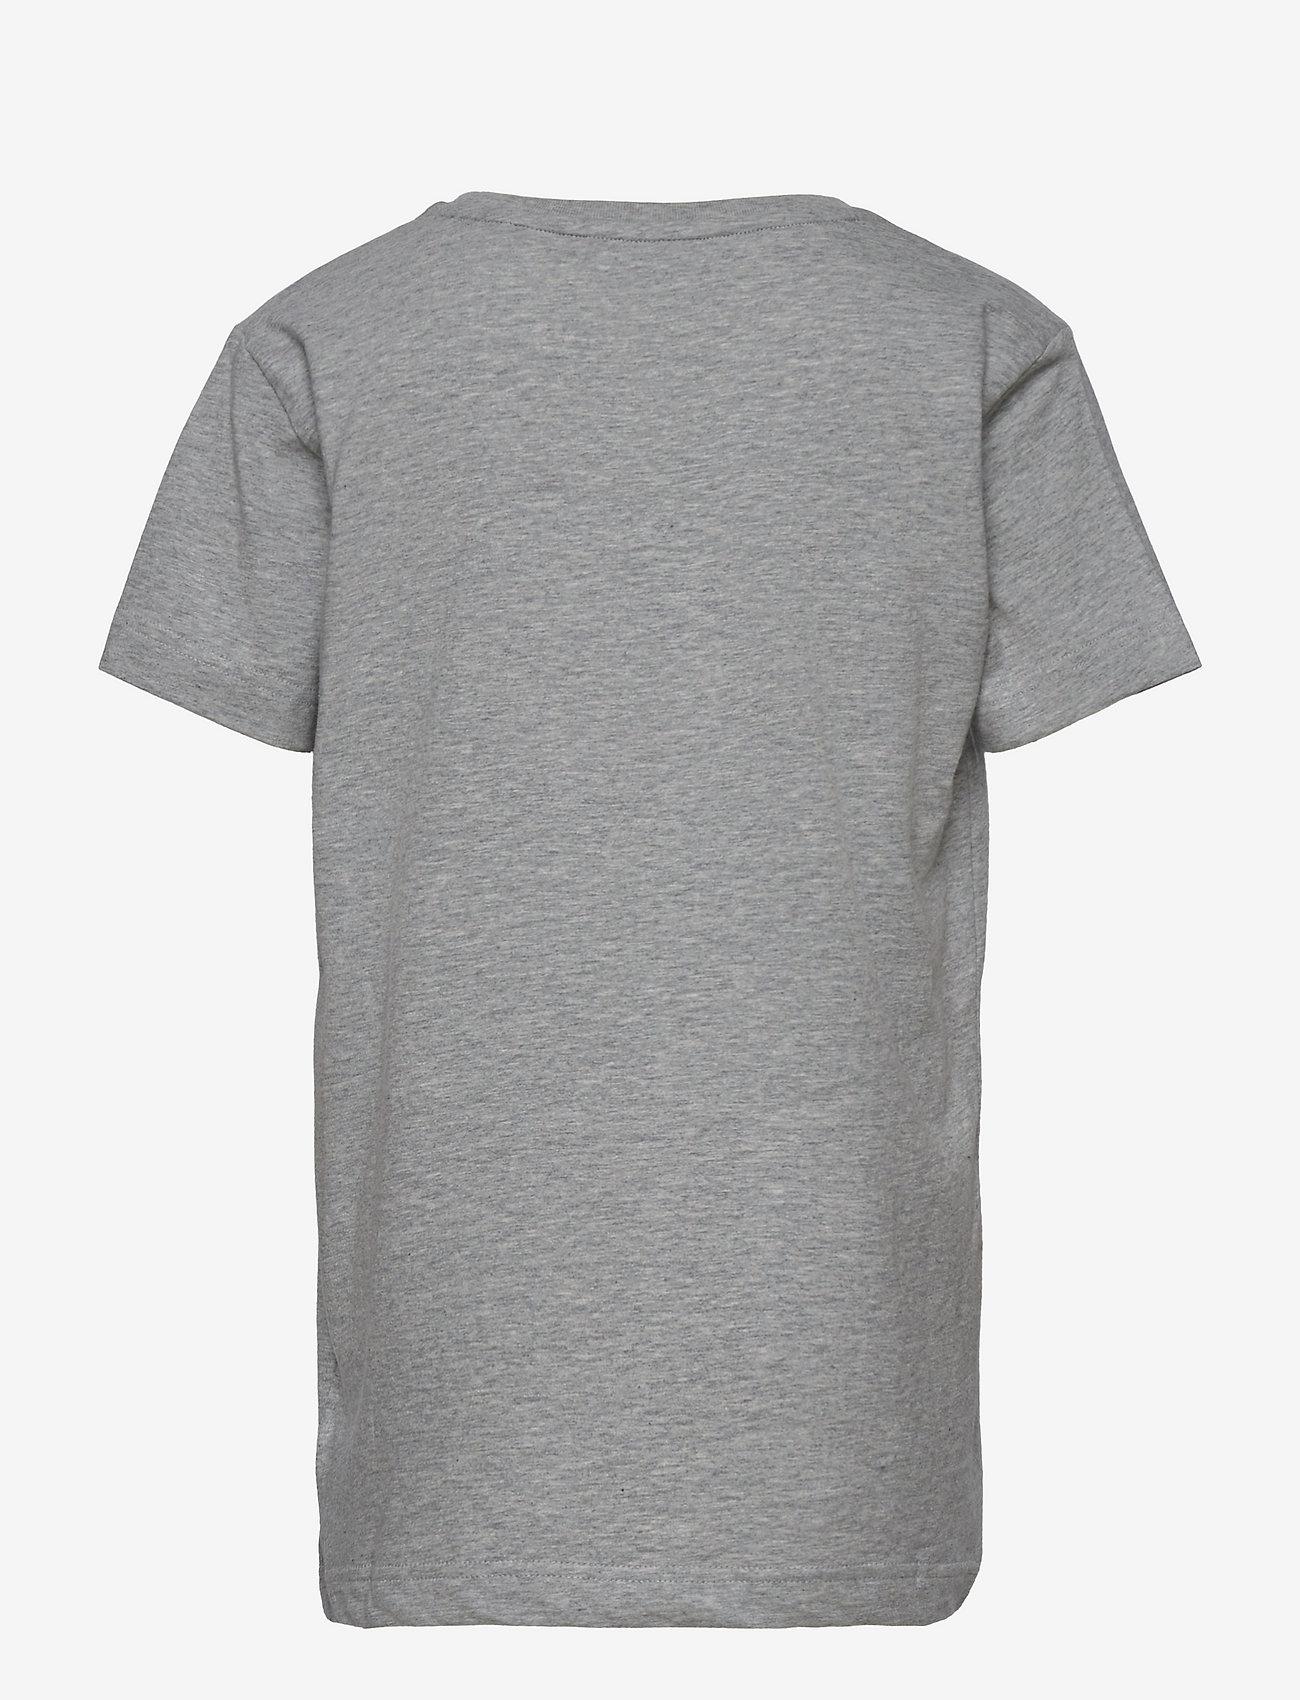 GANT - ARCHIVE SHIELD EMB SS T-SHIRT - short-sleeved - light grey melange - 1